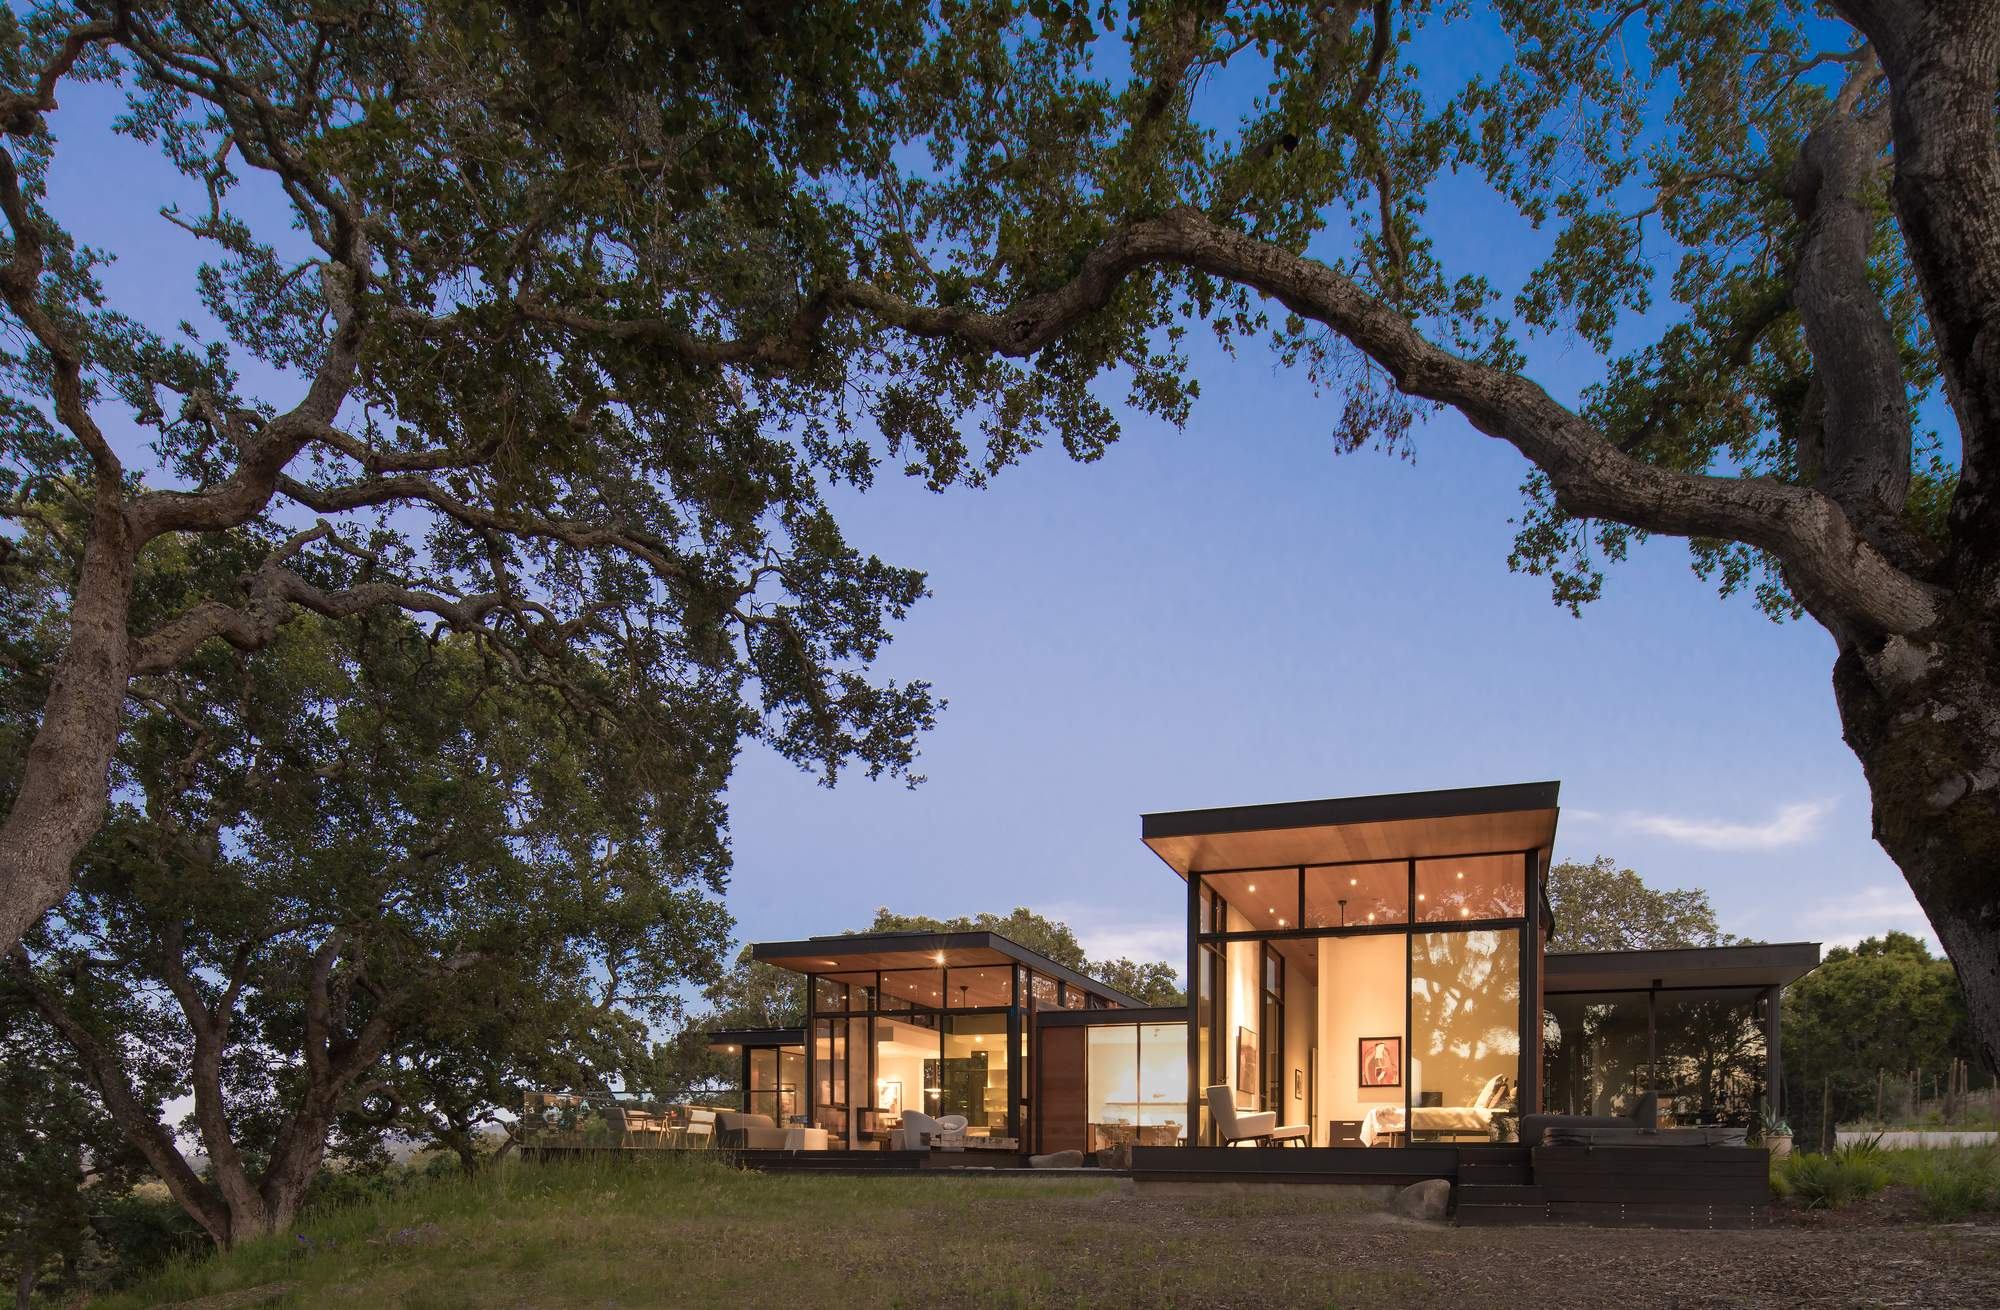 Дом среди дубового ландшафта, США